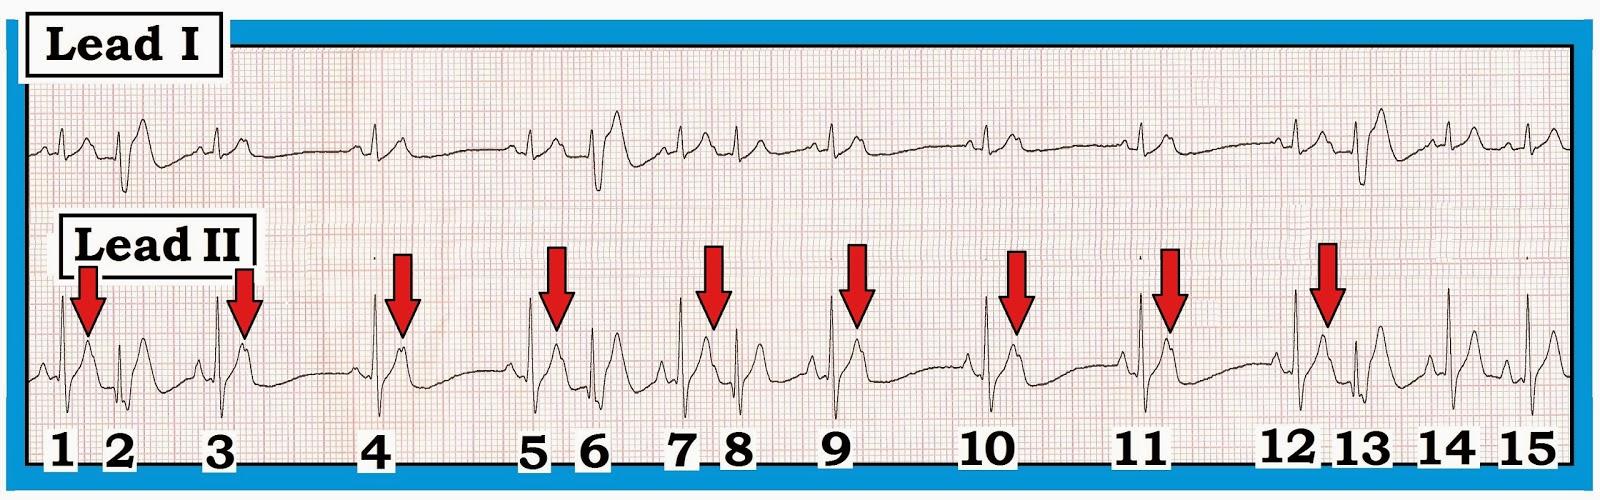 Ventricular Bigeminy Rhythm The Rhythm is Atrial Bigeminy